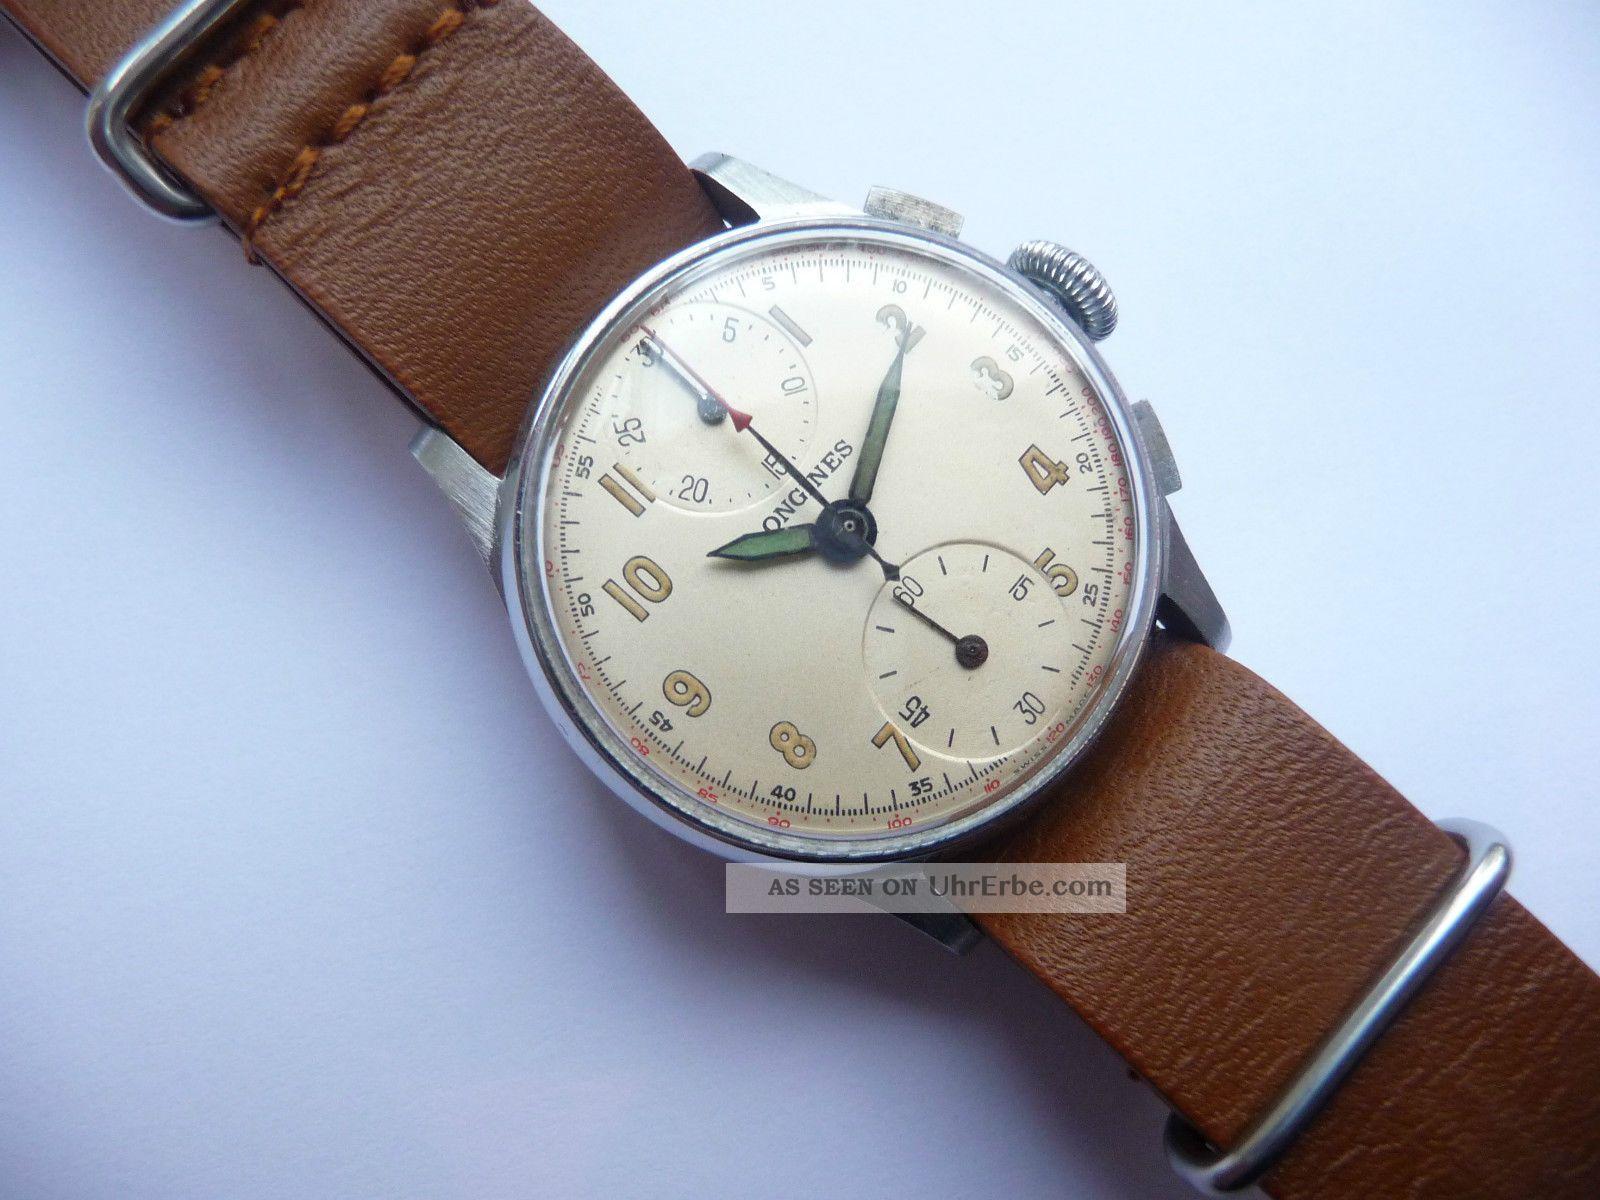 Longines Chronographe Schakelrad Movement Extreme Rare Vintage Watch Armbanduhren Bild